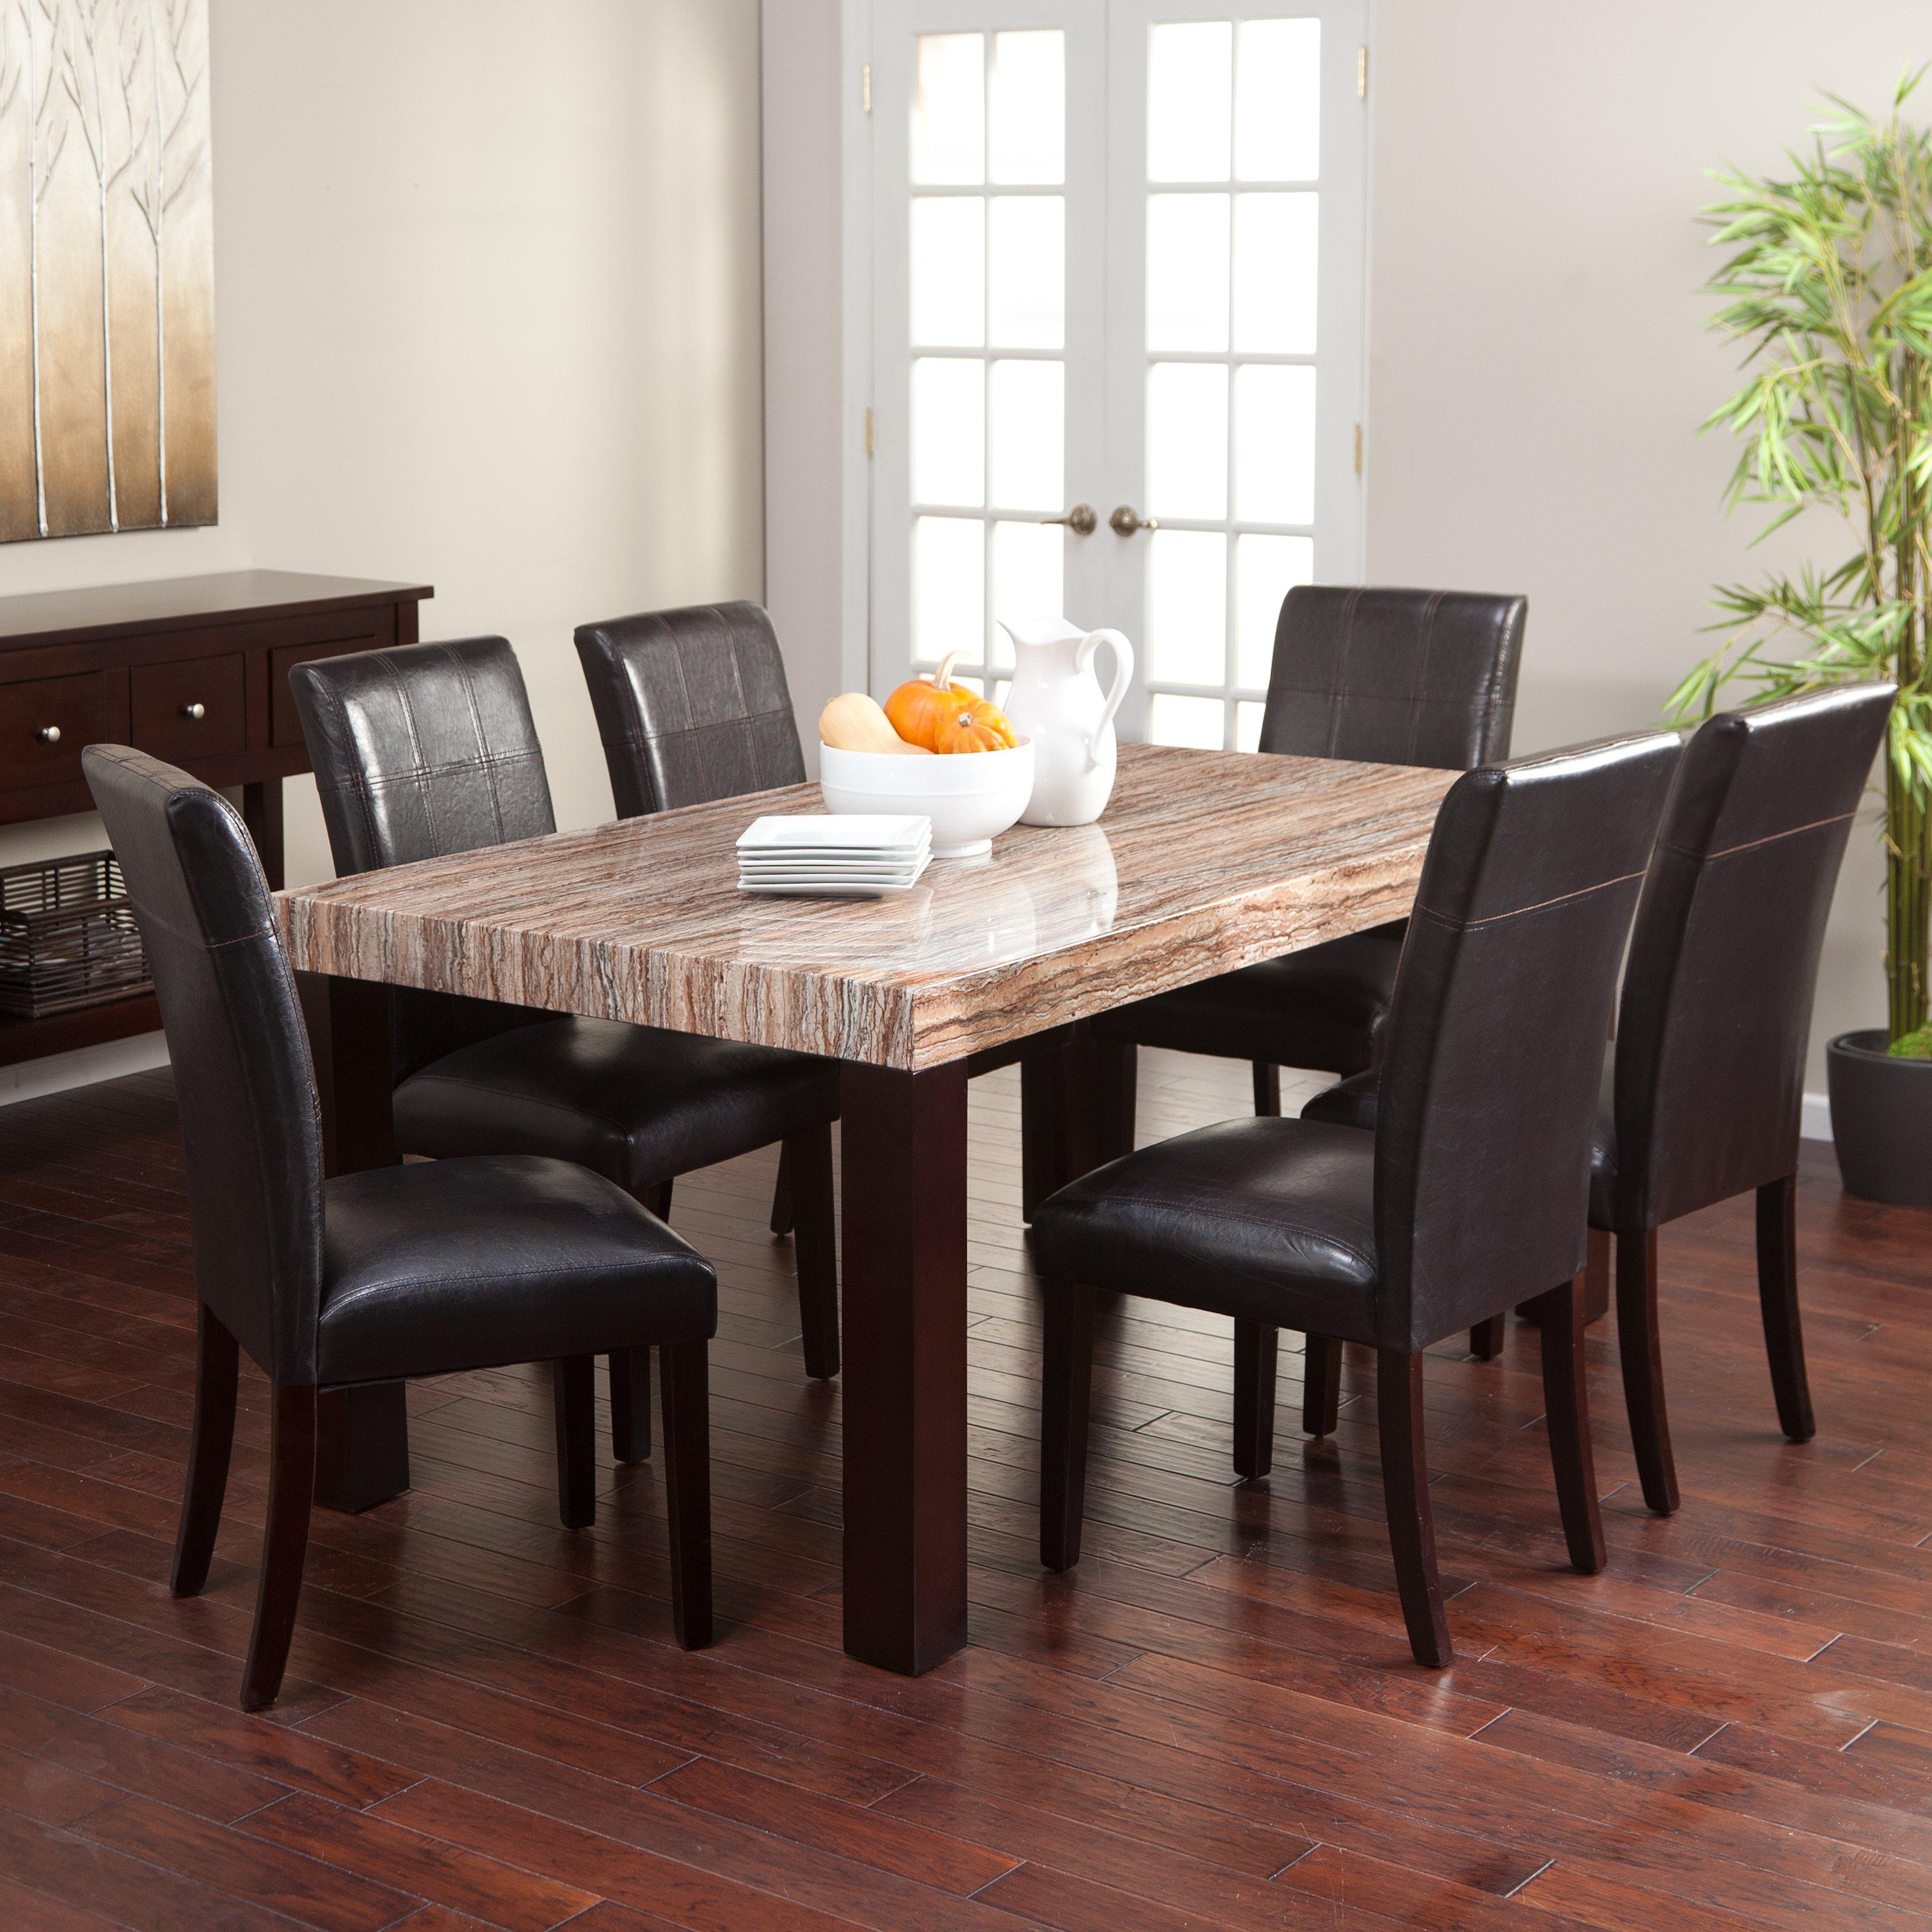 Kitchen table sets carmine red 7-piece dining table set |  Hayneedle KGCDHVK